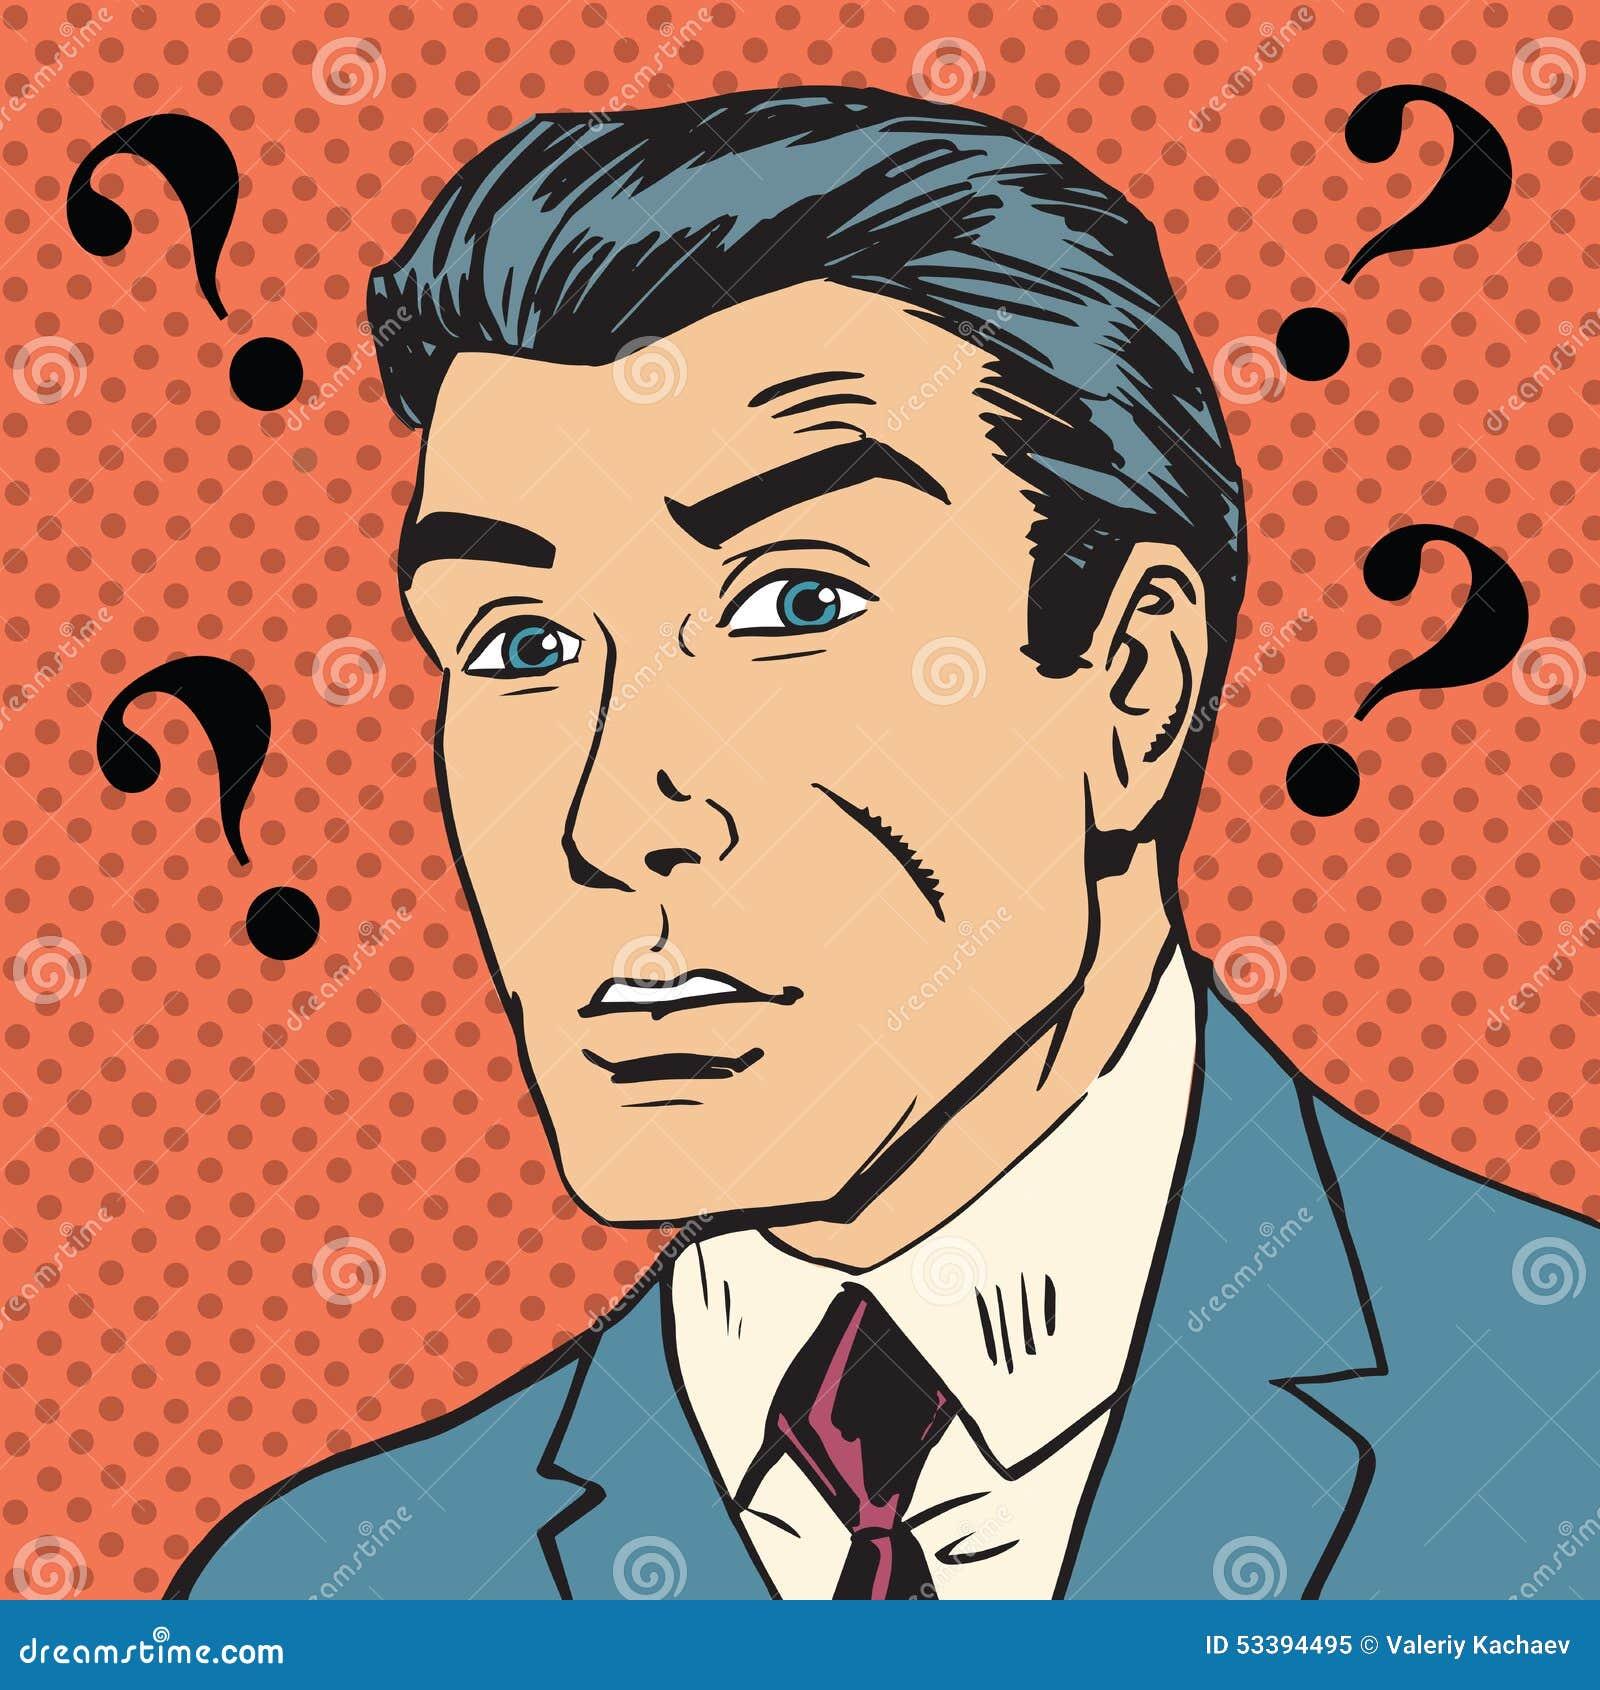 Male Question Marks Misunderstanding Enigma Men Pop Art ...